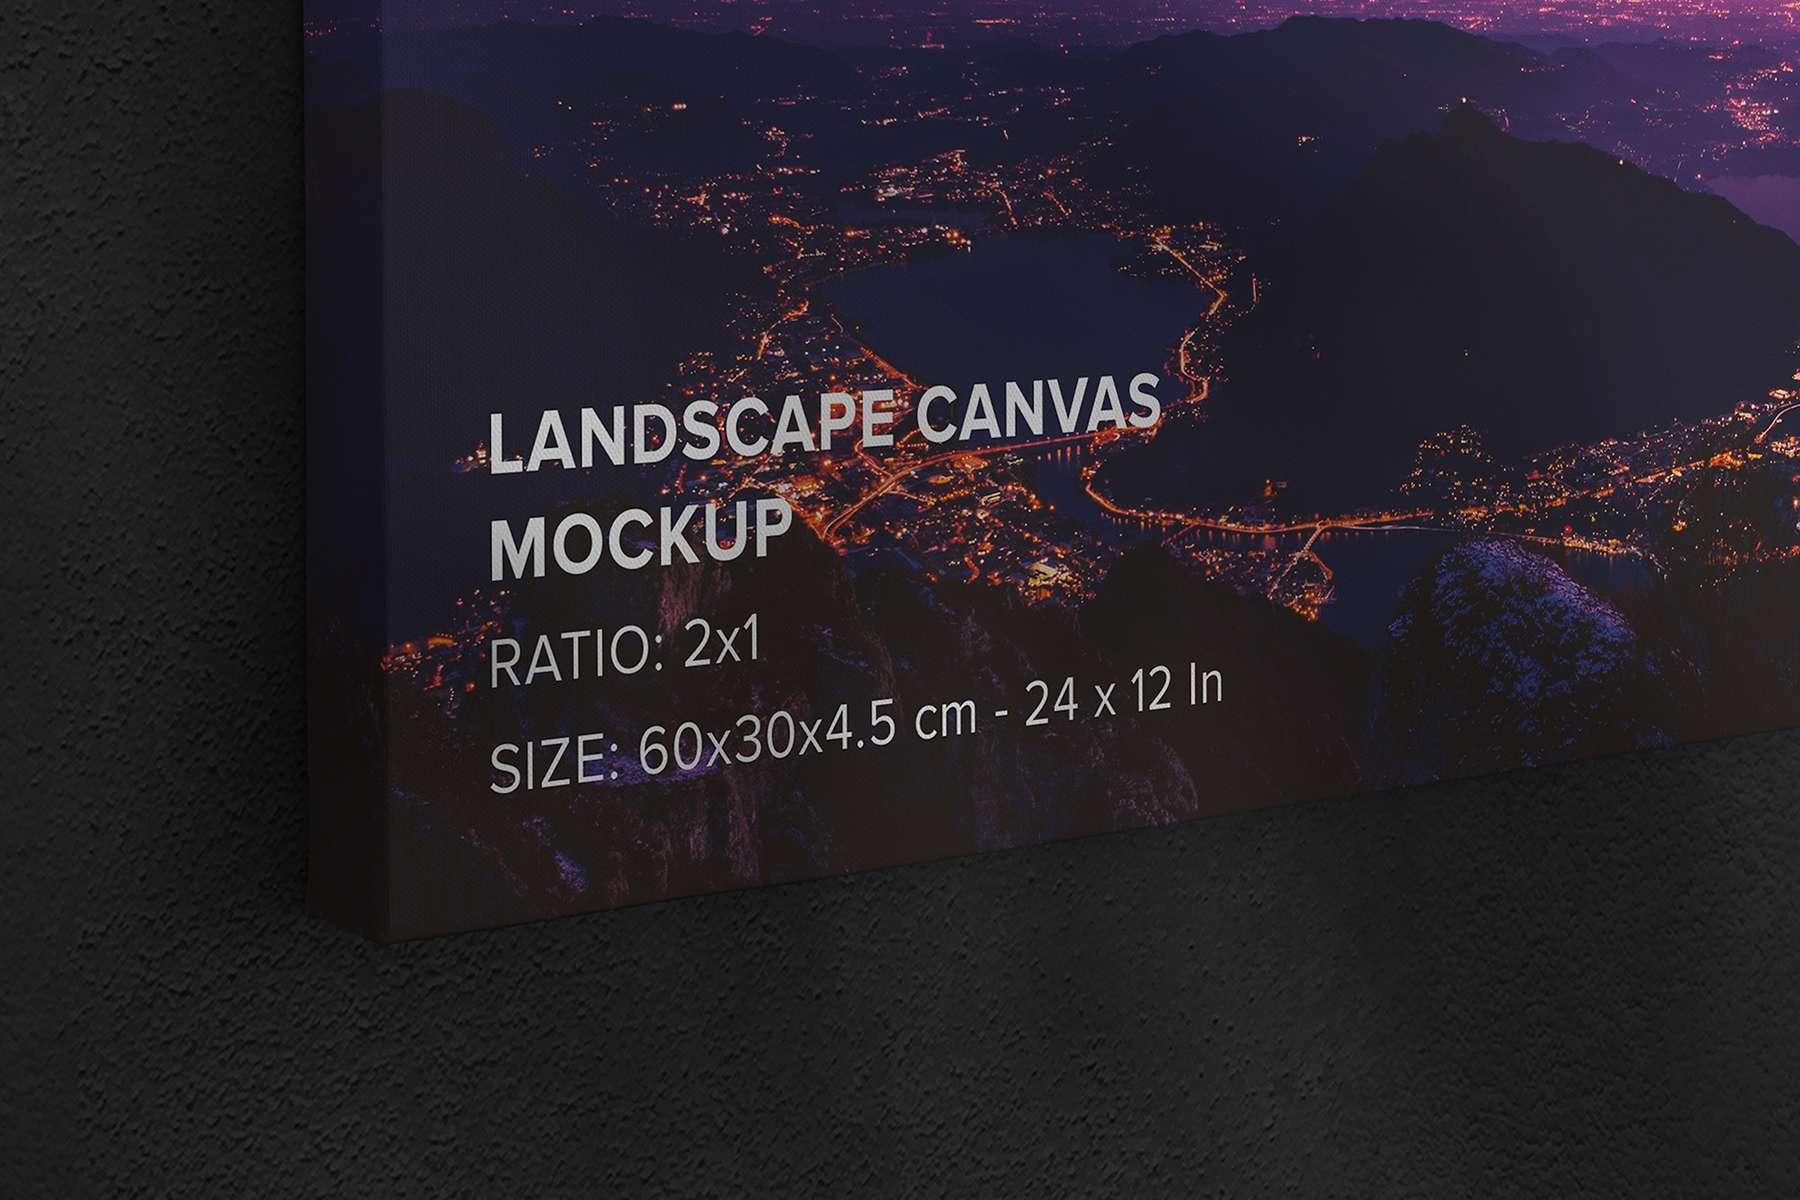 Hanging Landscape Canvas Ratio 2x1 Mockup